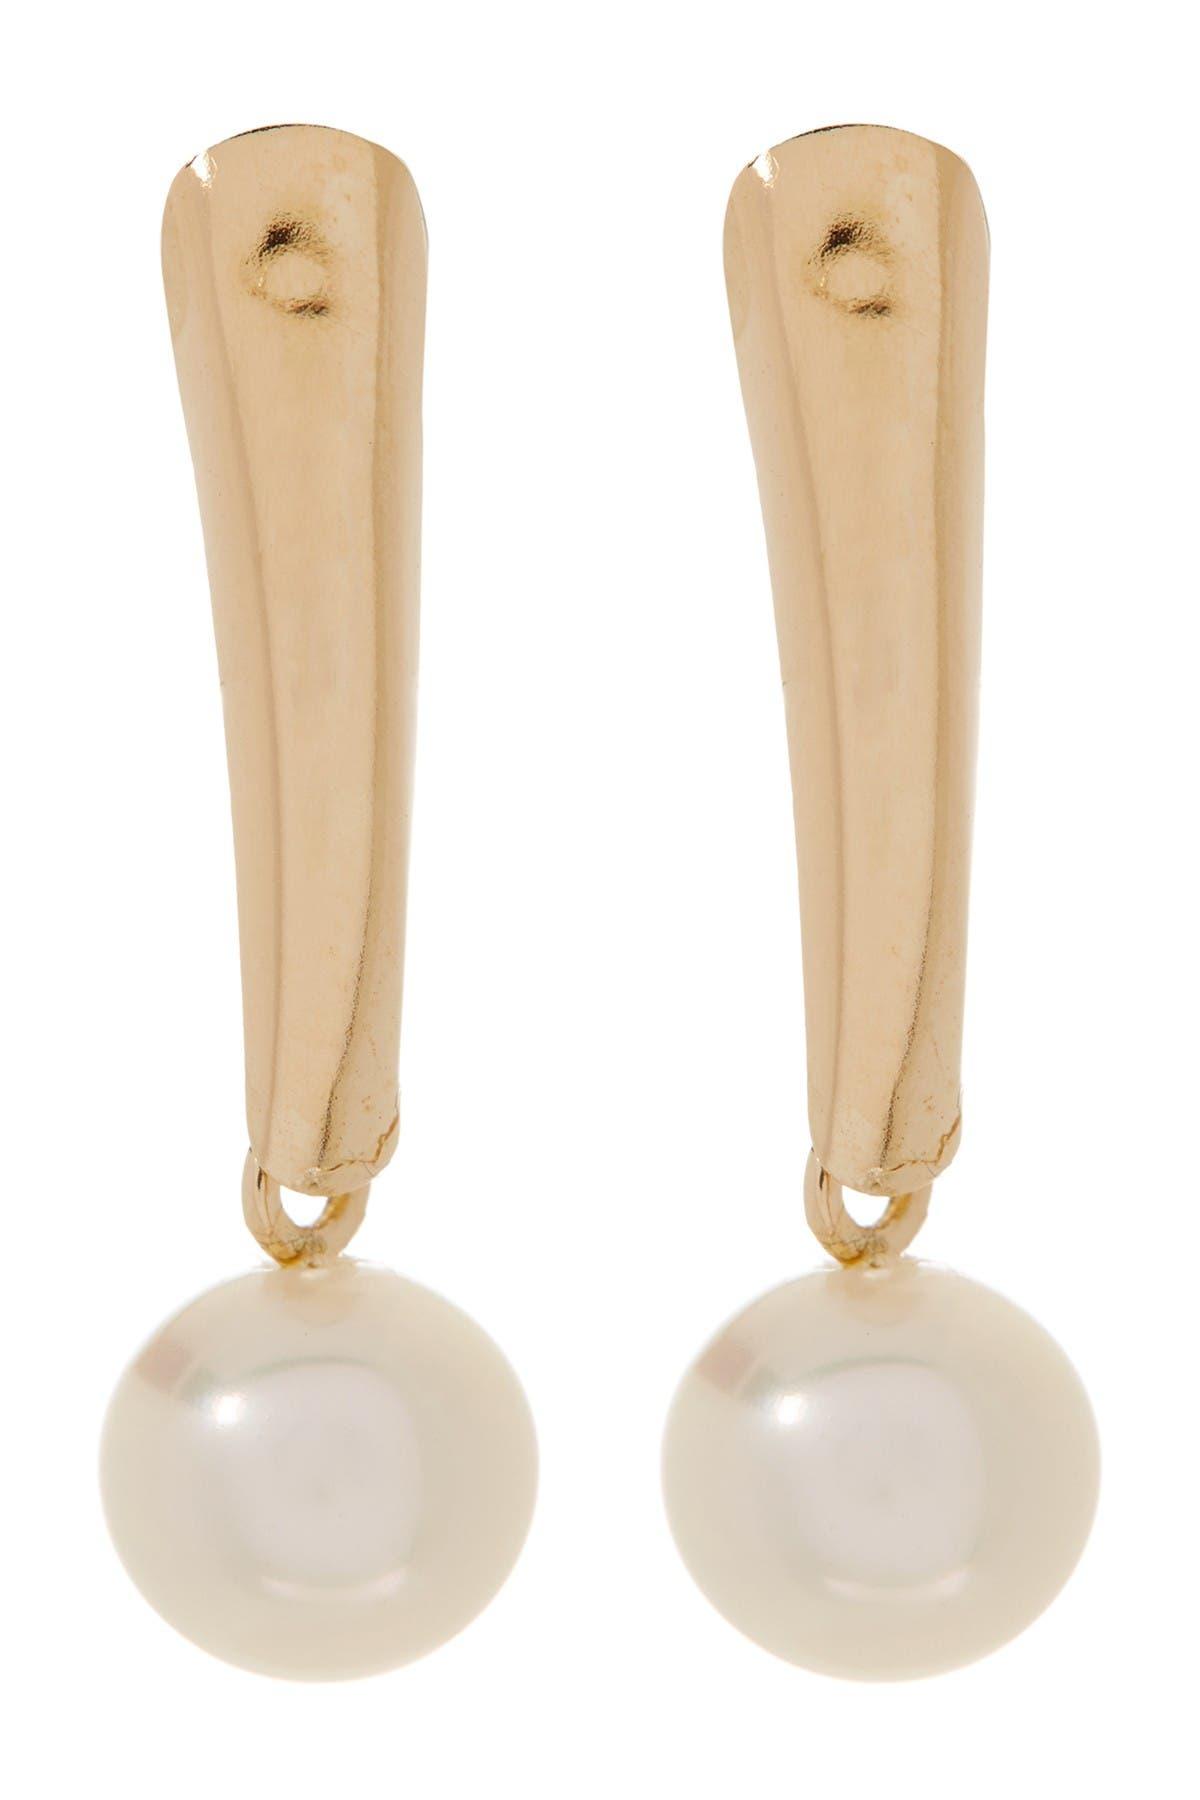 Image of Splendid Pearls 14K Yellow Gold 5.5-6mm White Freshwater Pearl Shield Drop Earrings